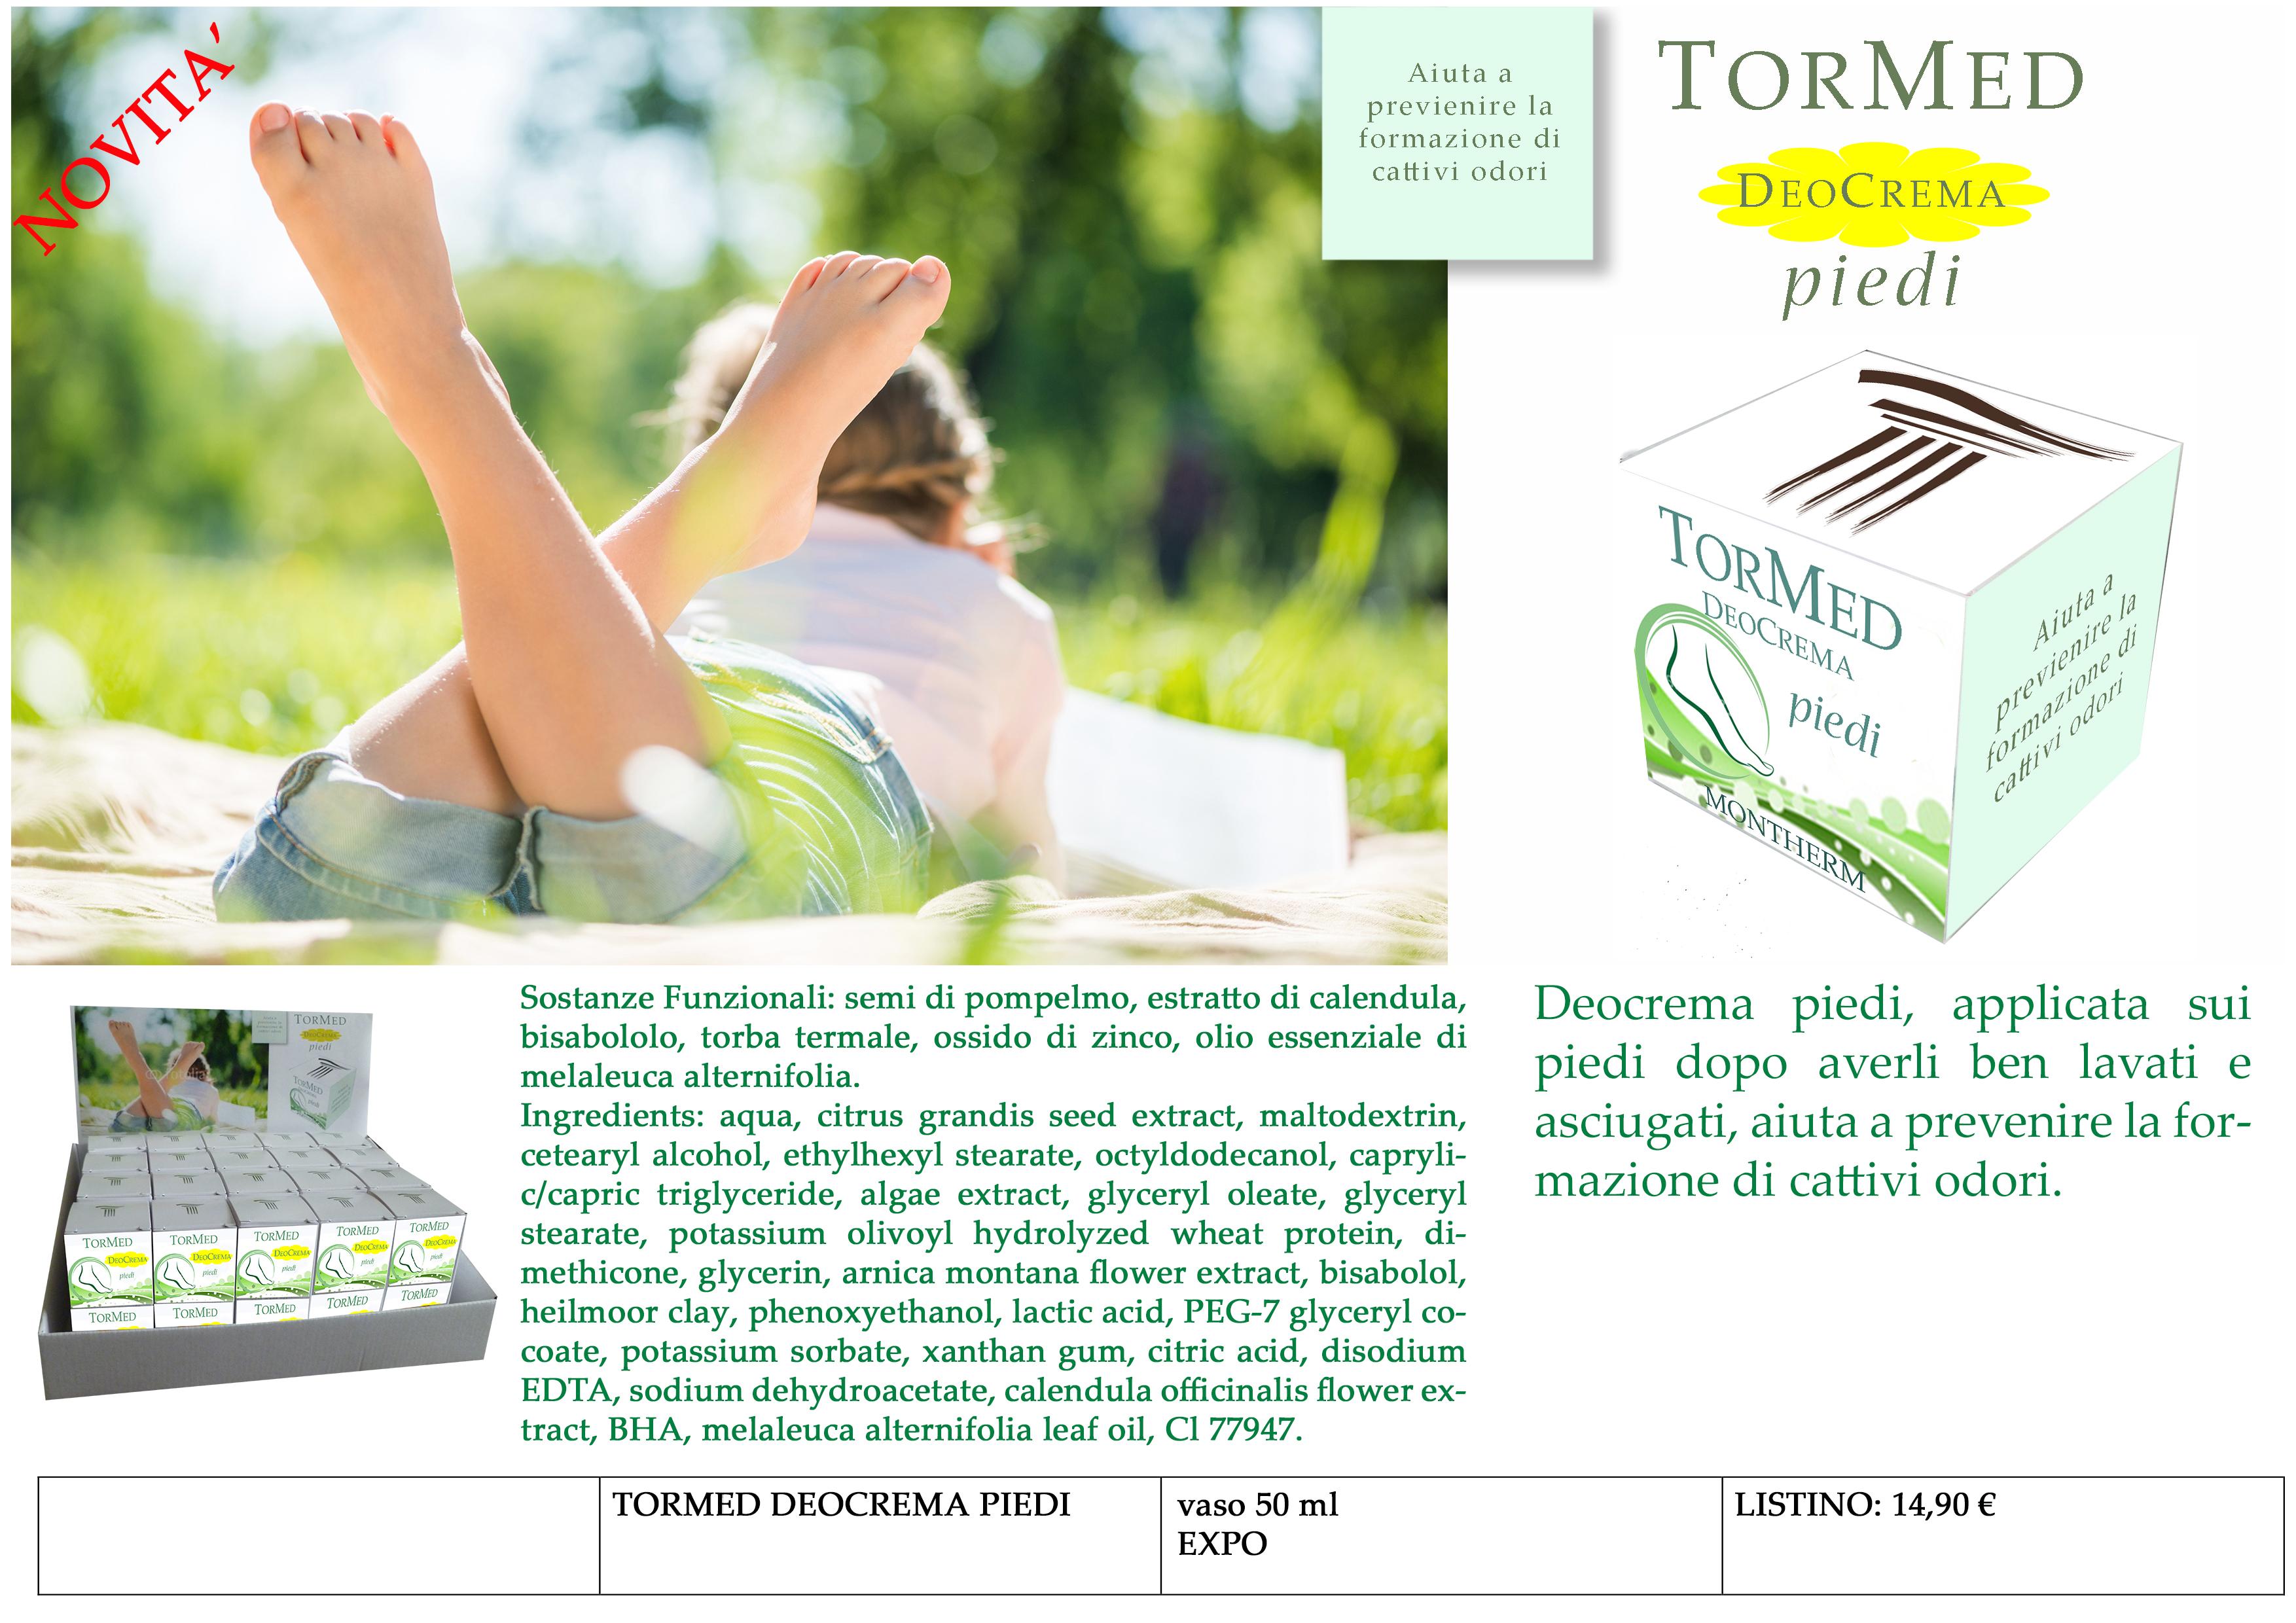 TORMED deocrema piedi